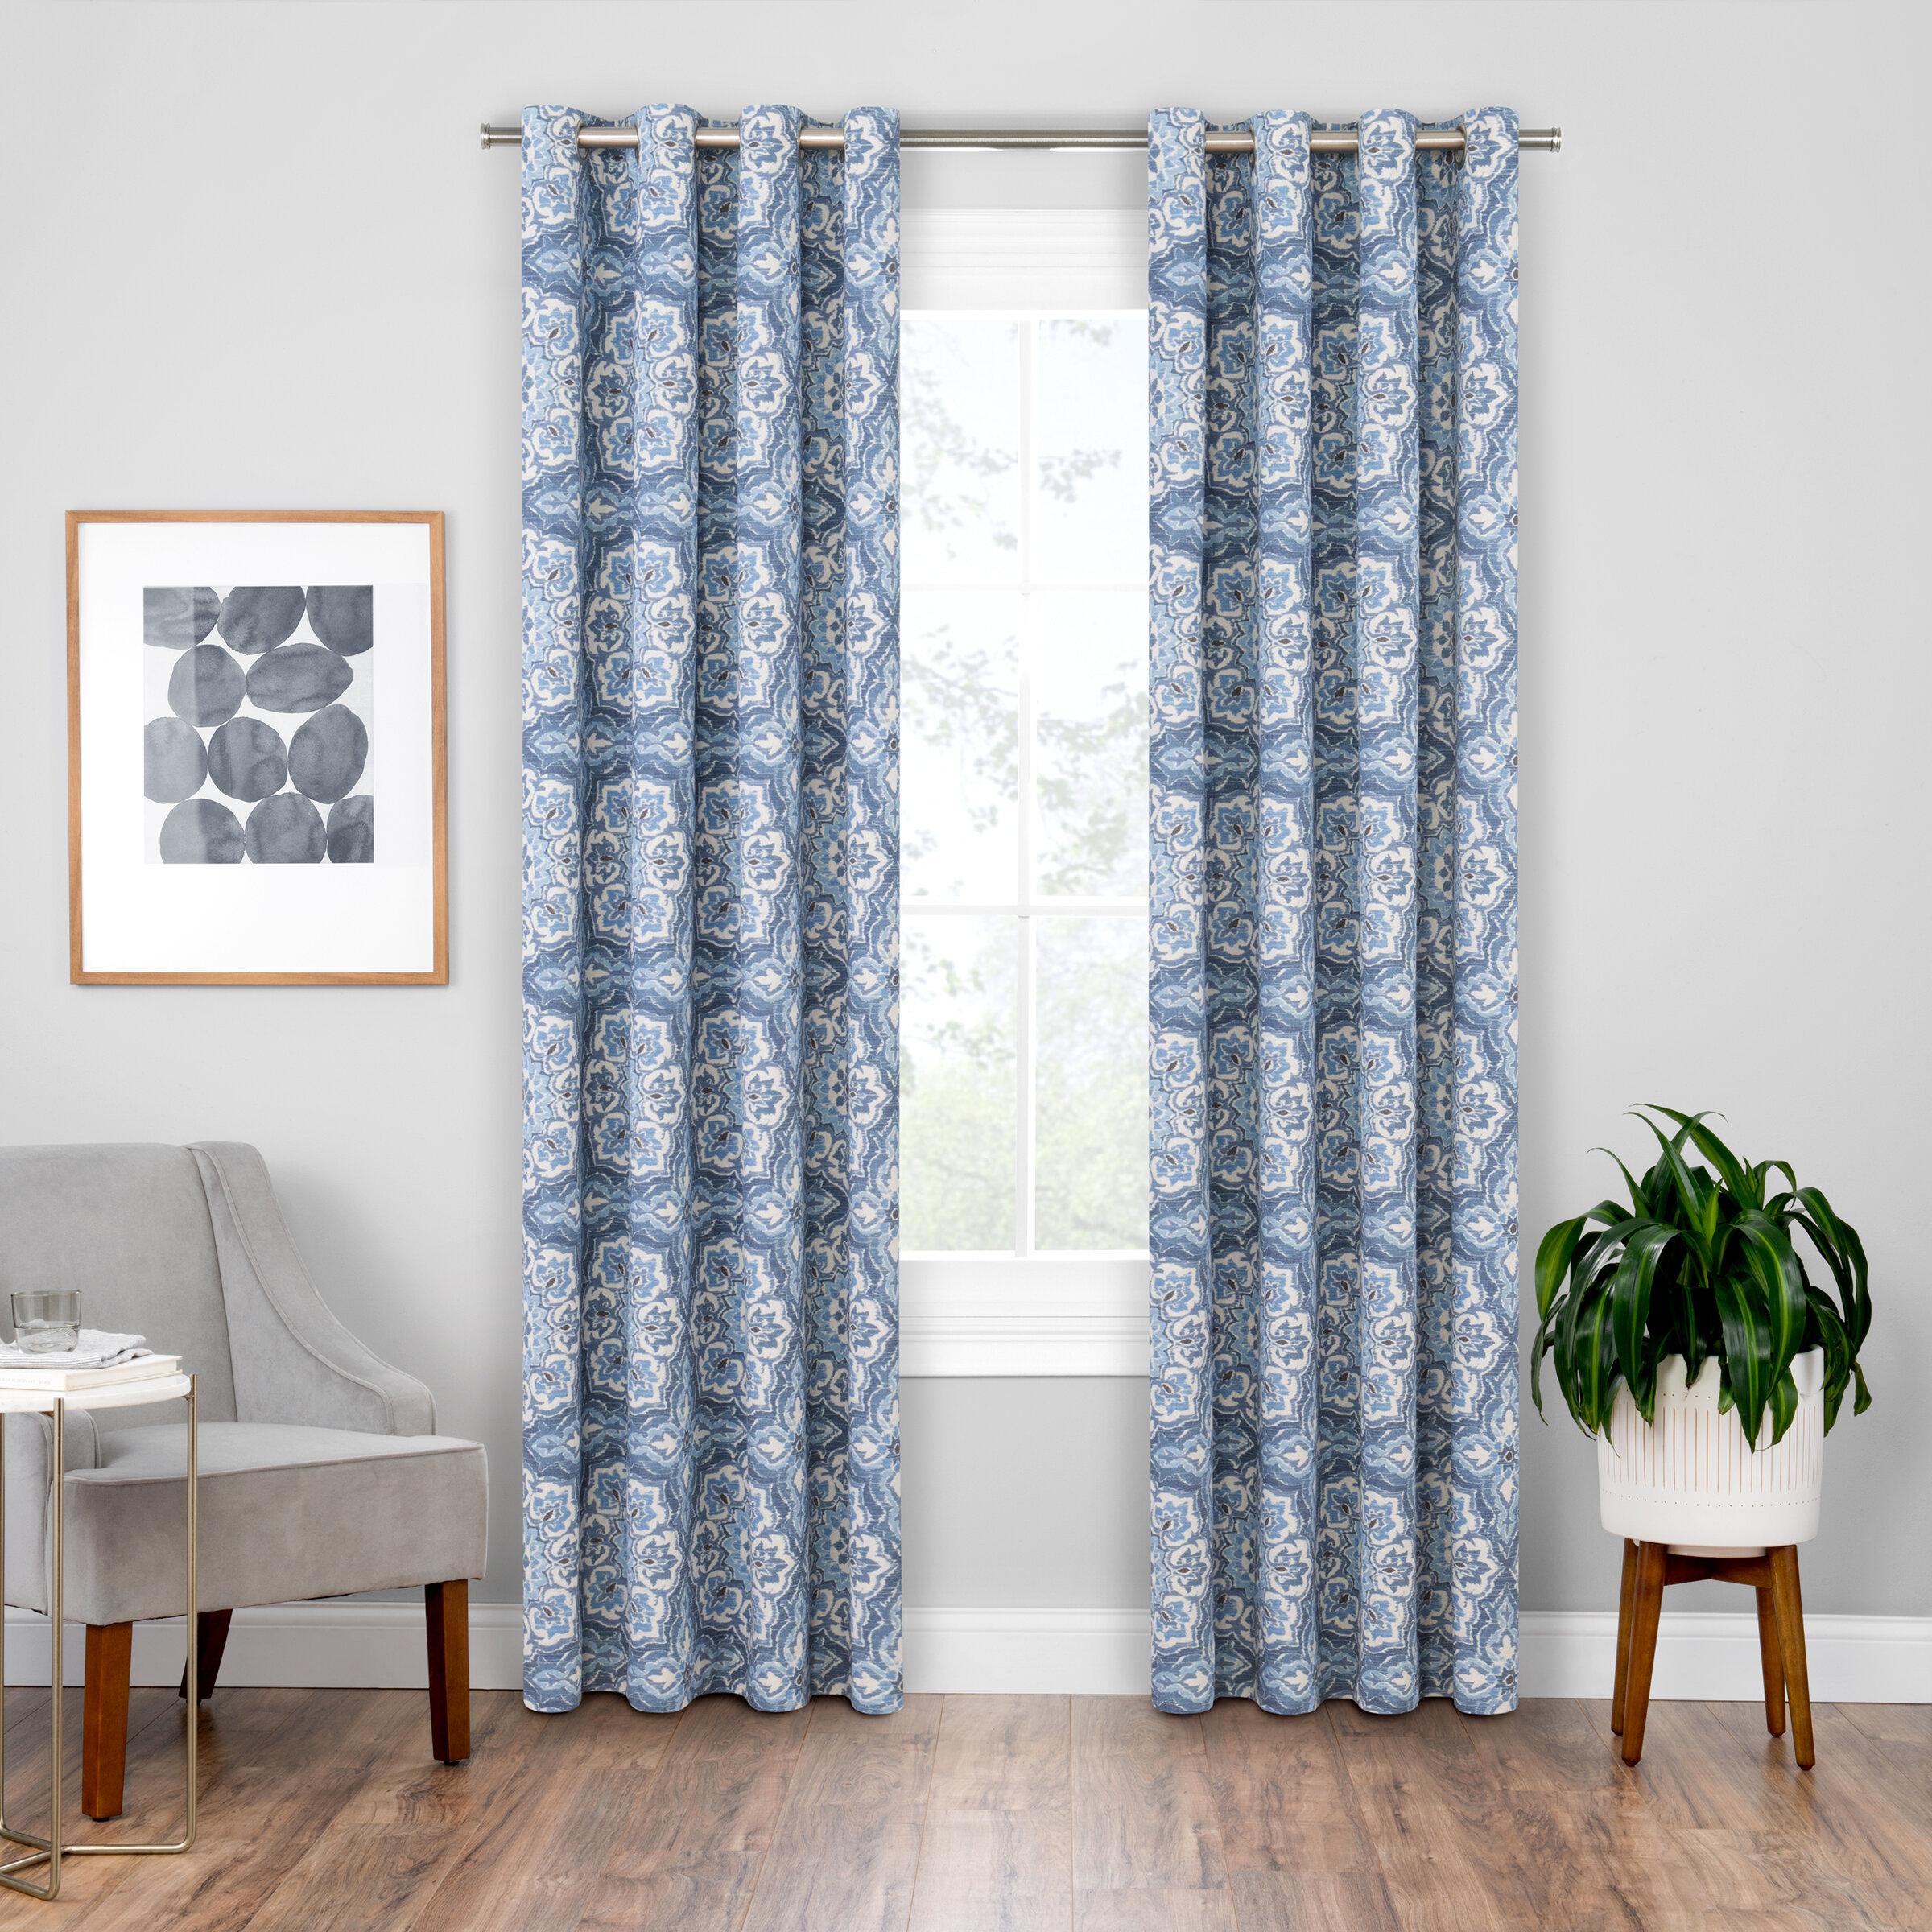 Multicolor Curtains   Wayfair With Regard To Vina Sheer Bird Single Curtain Panels (View 18 of 30)